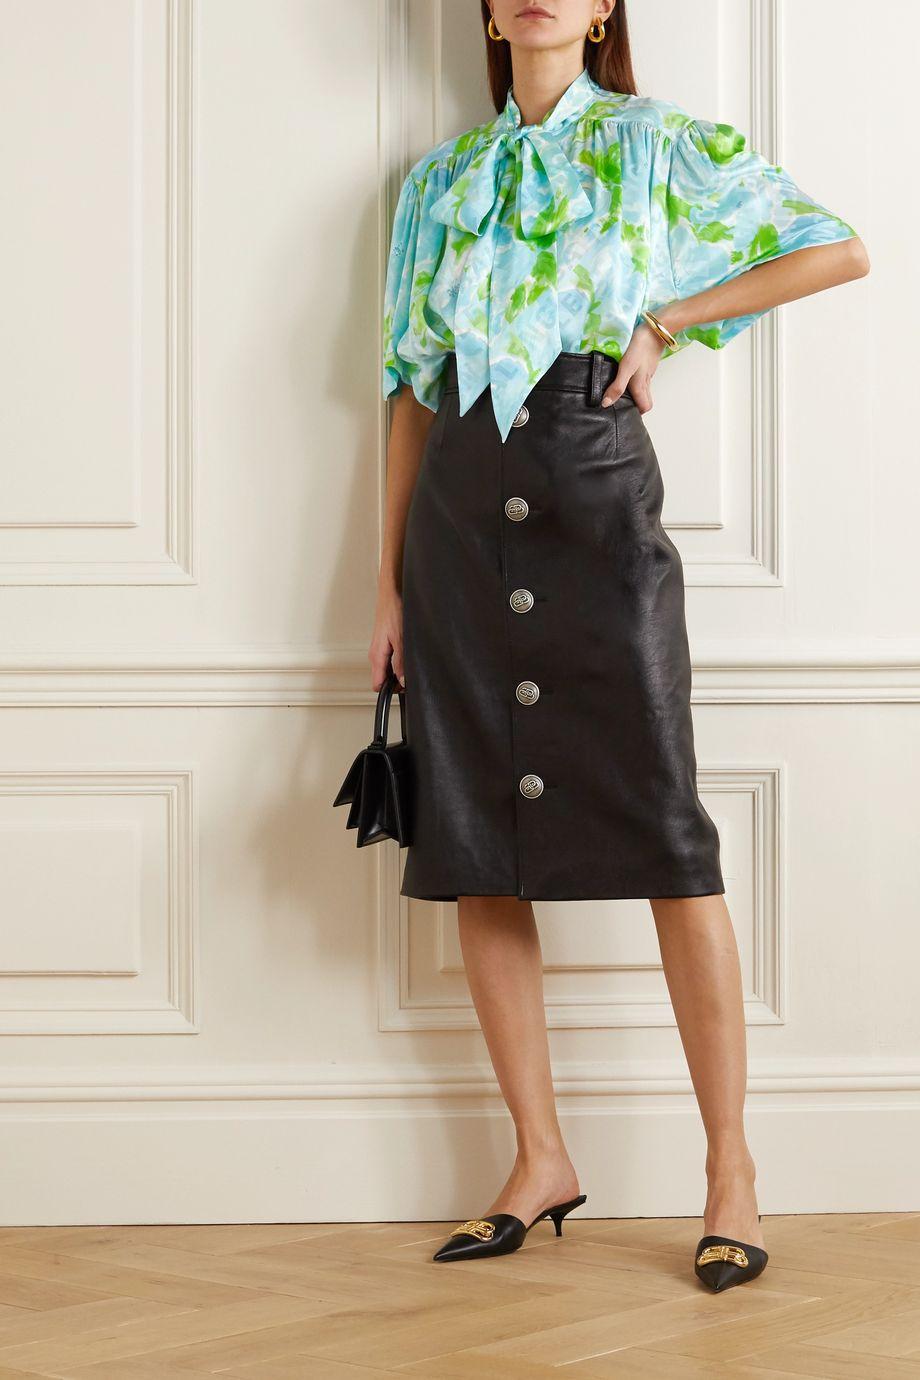 Balenciaga Pussy-bow floral-print silk-jacquard blouse